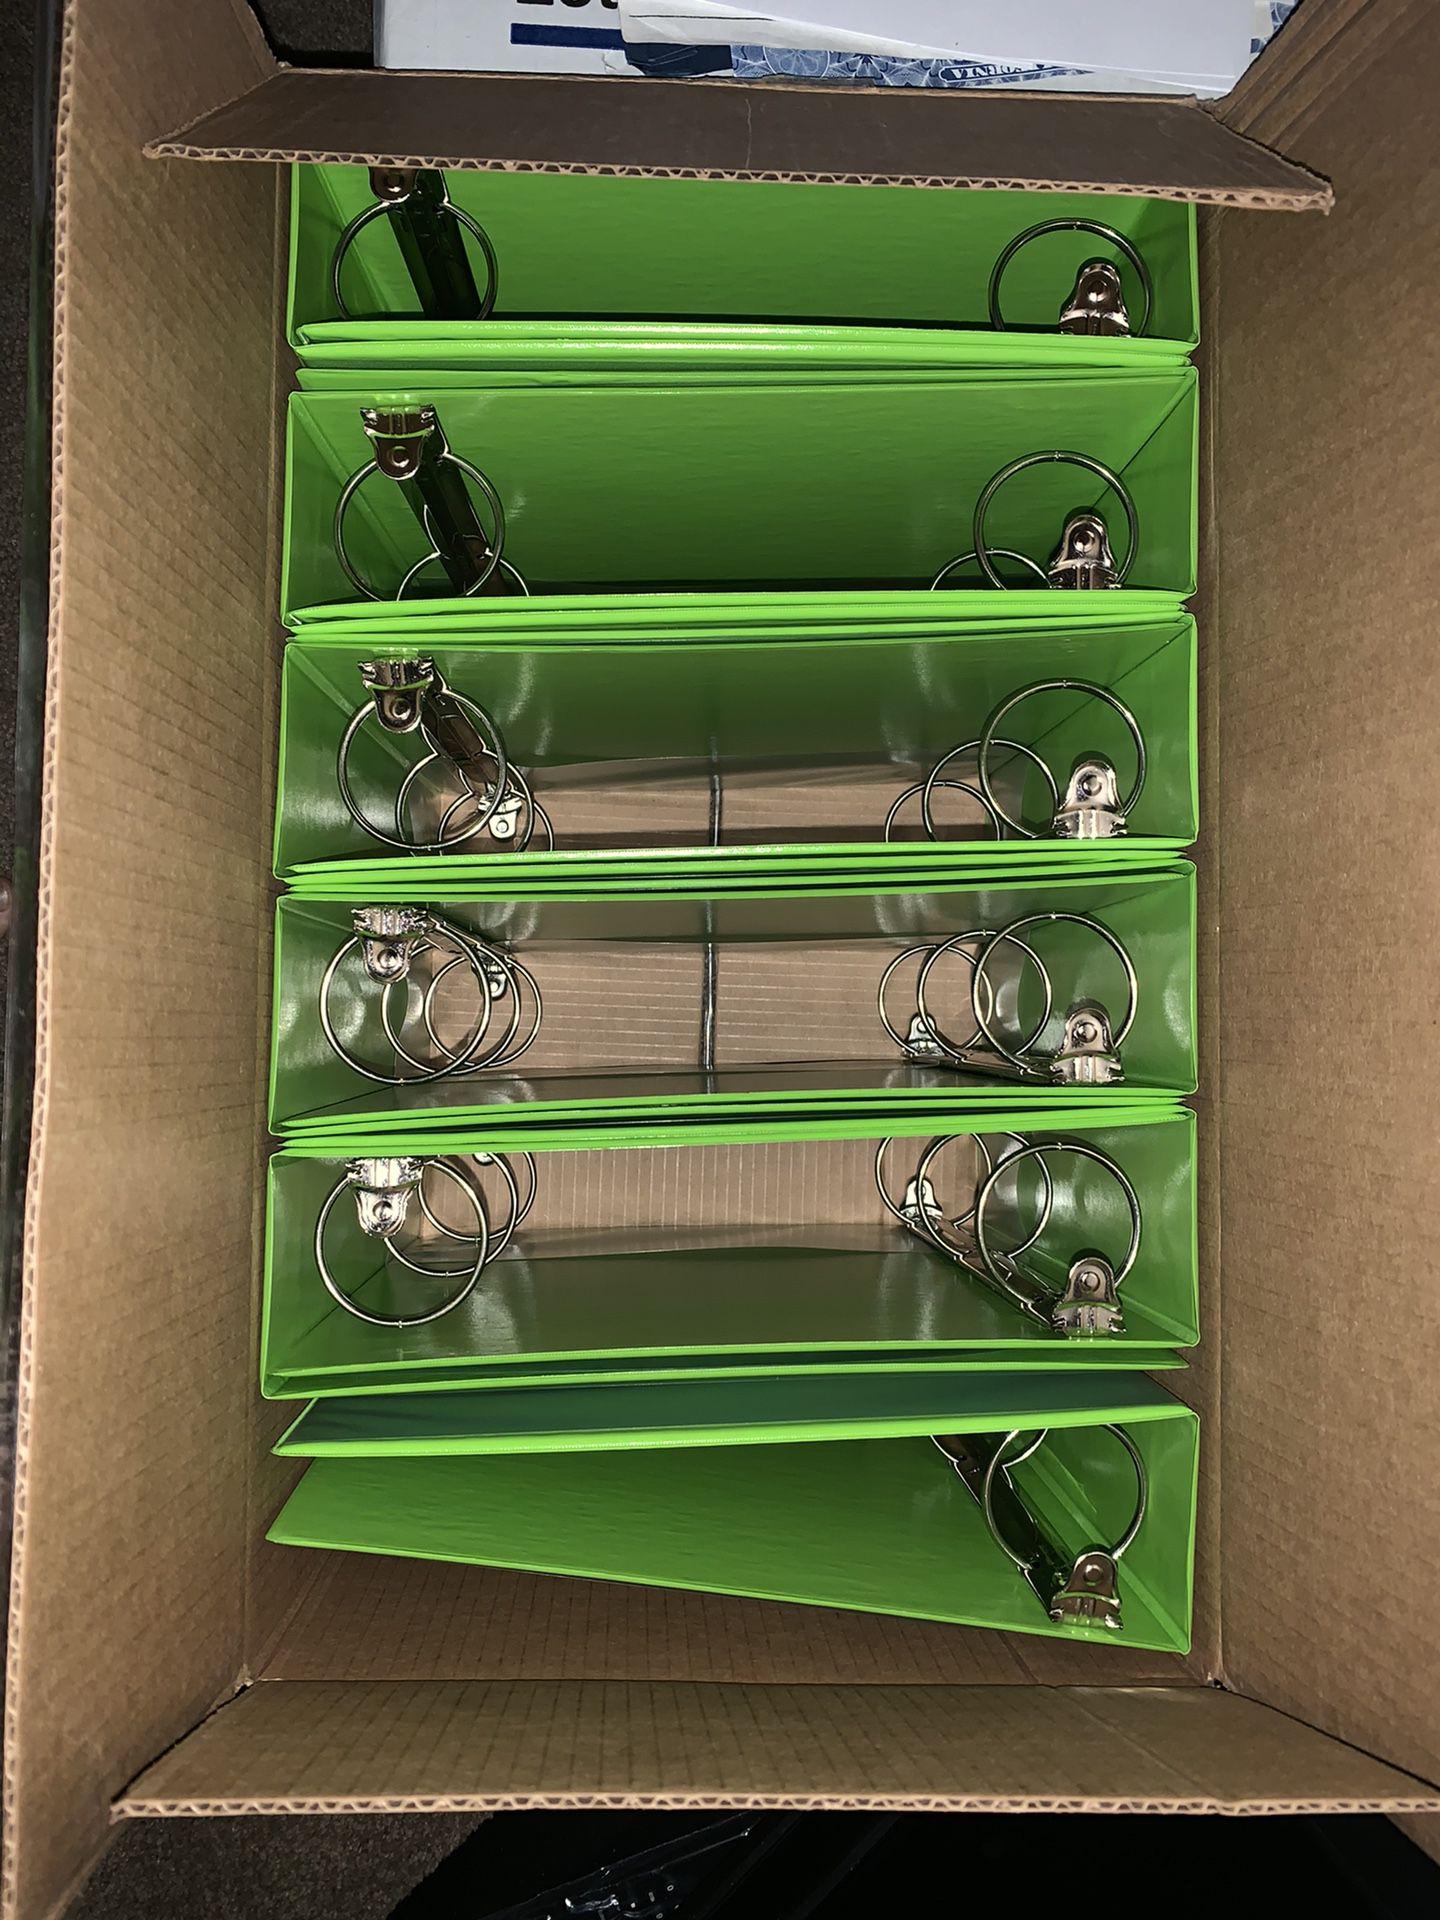 "New 3 Ring Binders, 3"", Green, Amazon basics"